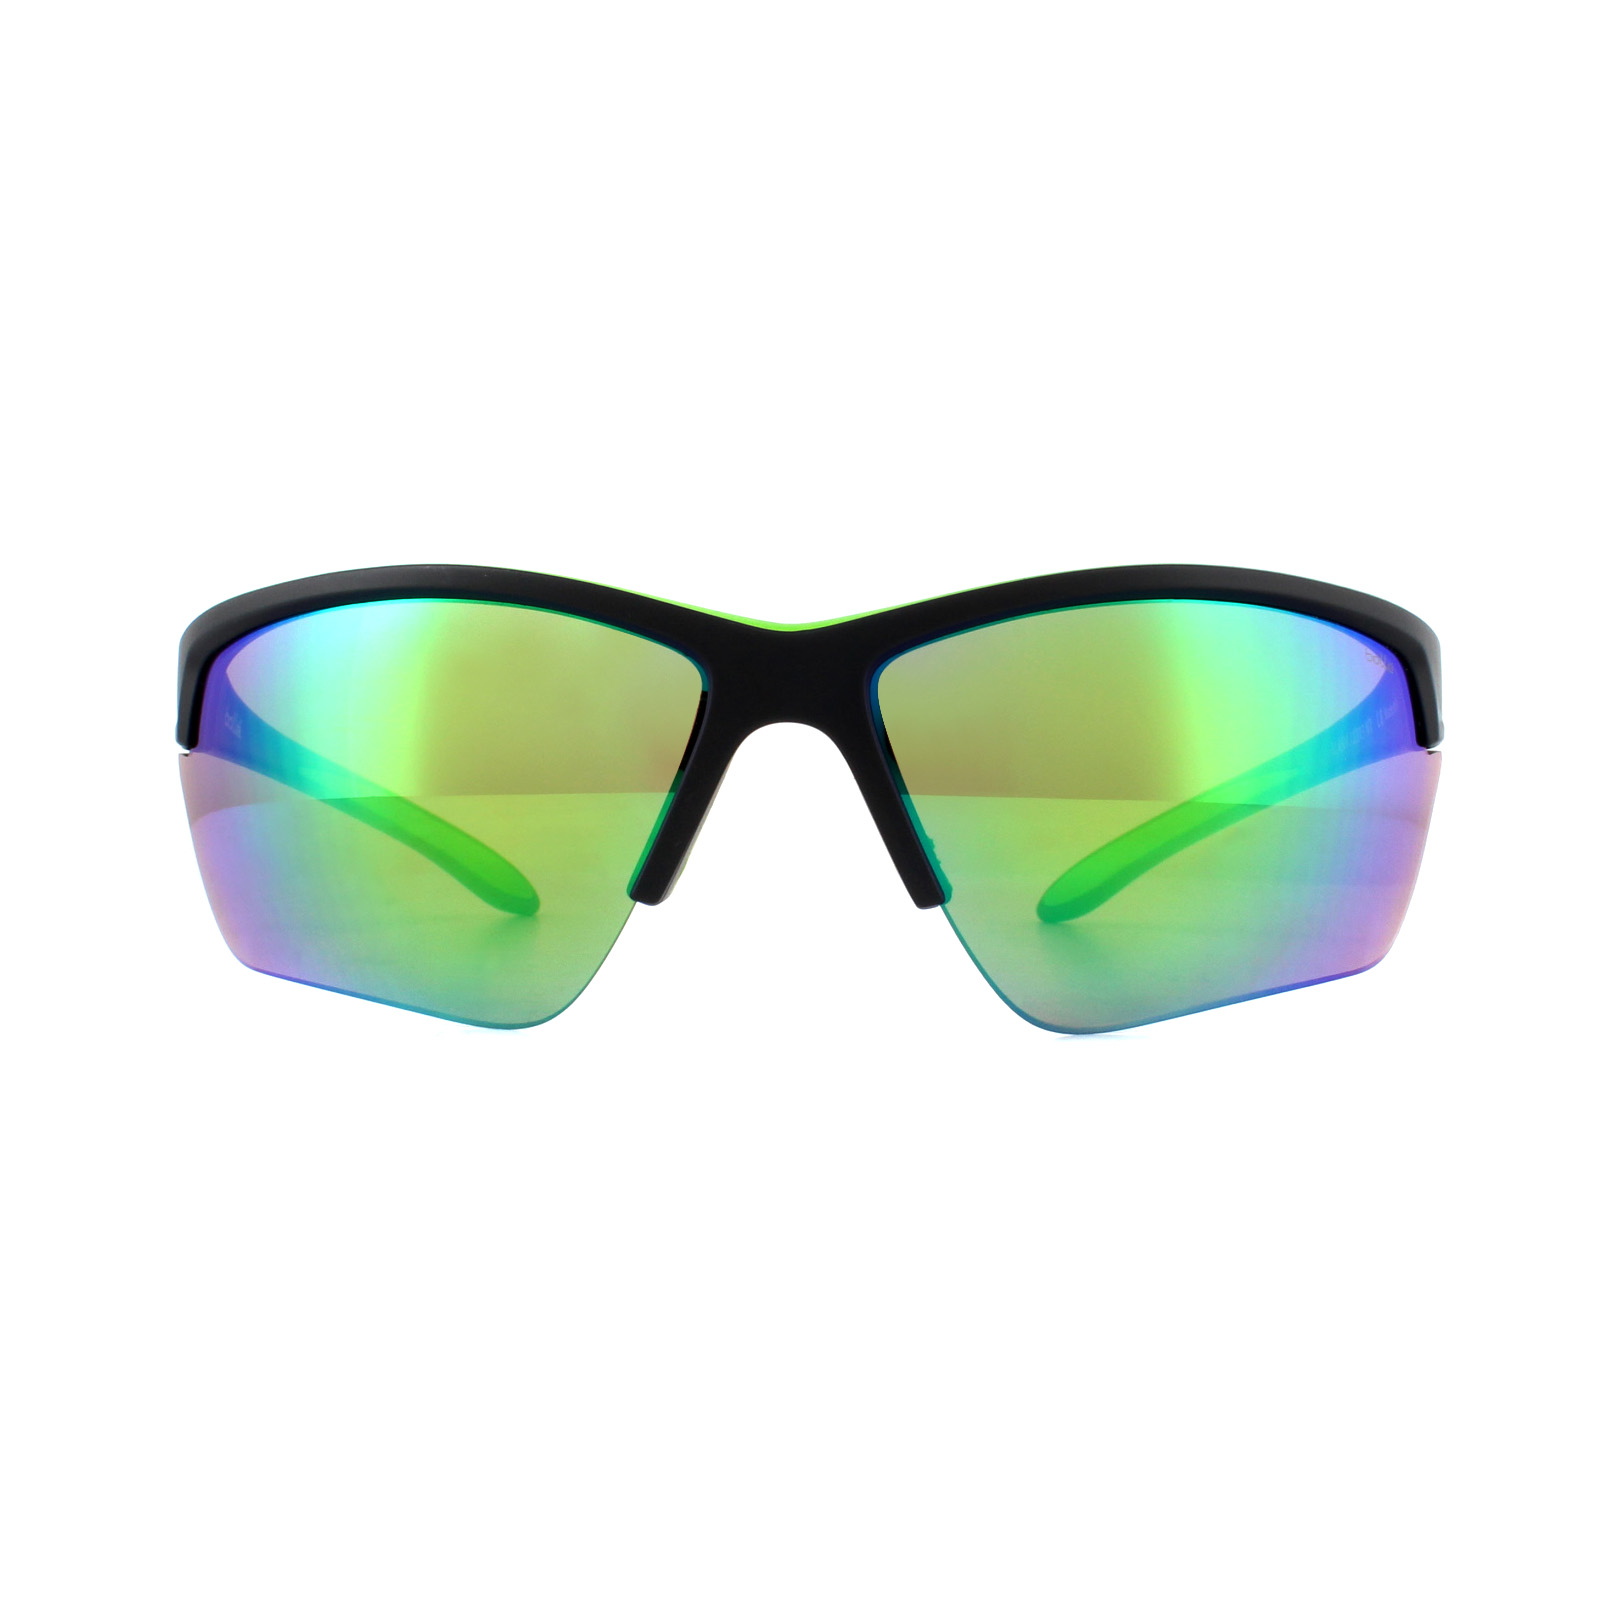 740c2f58bf Sentinel Bolle Sunglasses Flash 12213 Matt Black Green Brown Emerald